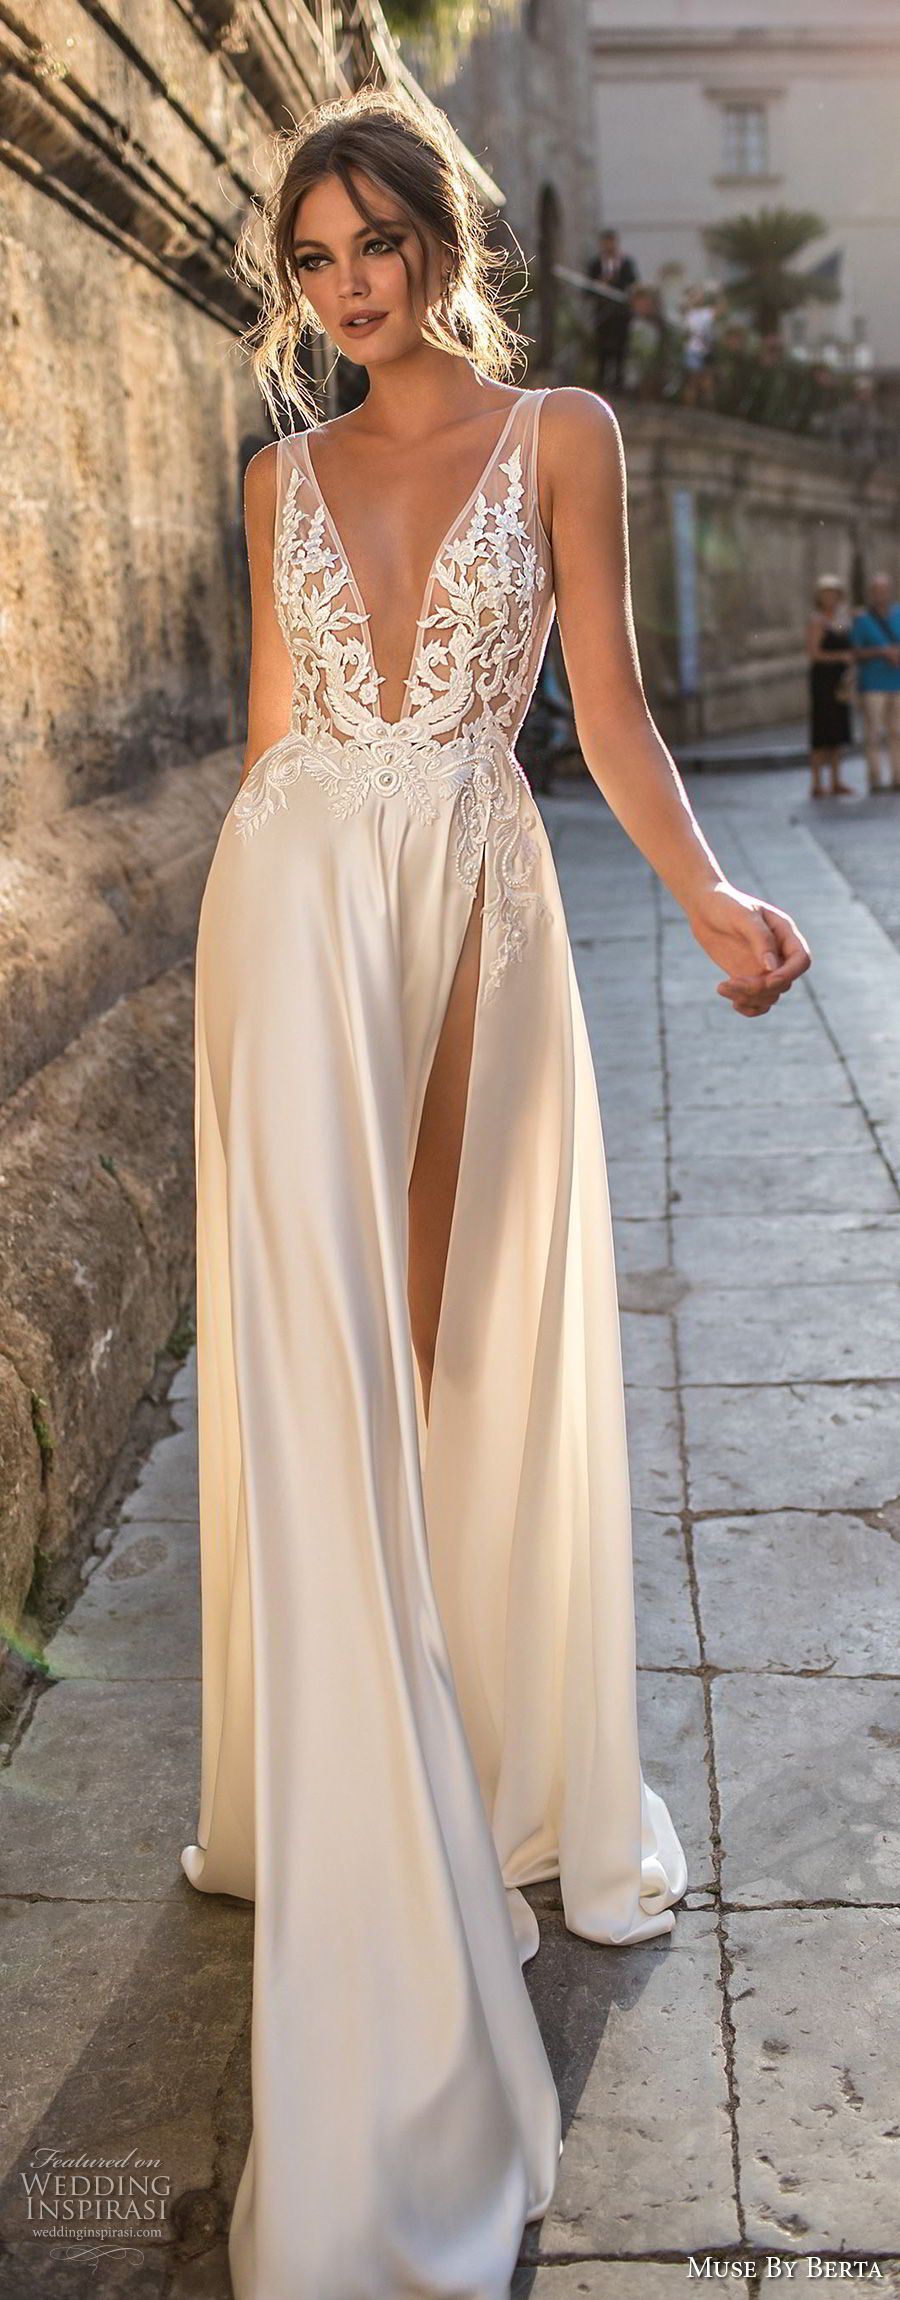 Muse by berta wedding dresses u sicily bridal campaign bridal